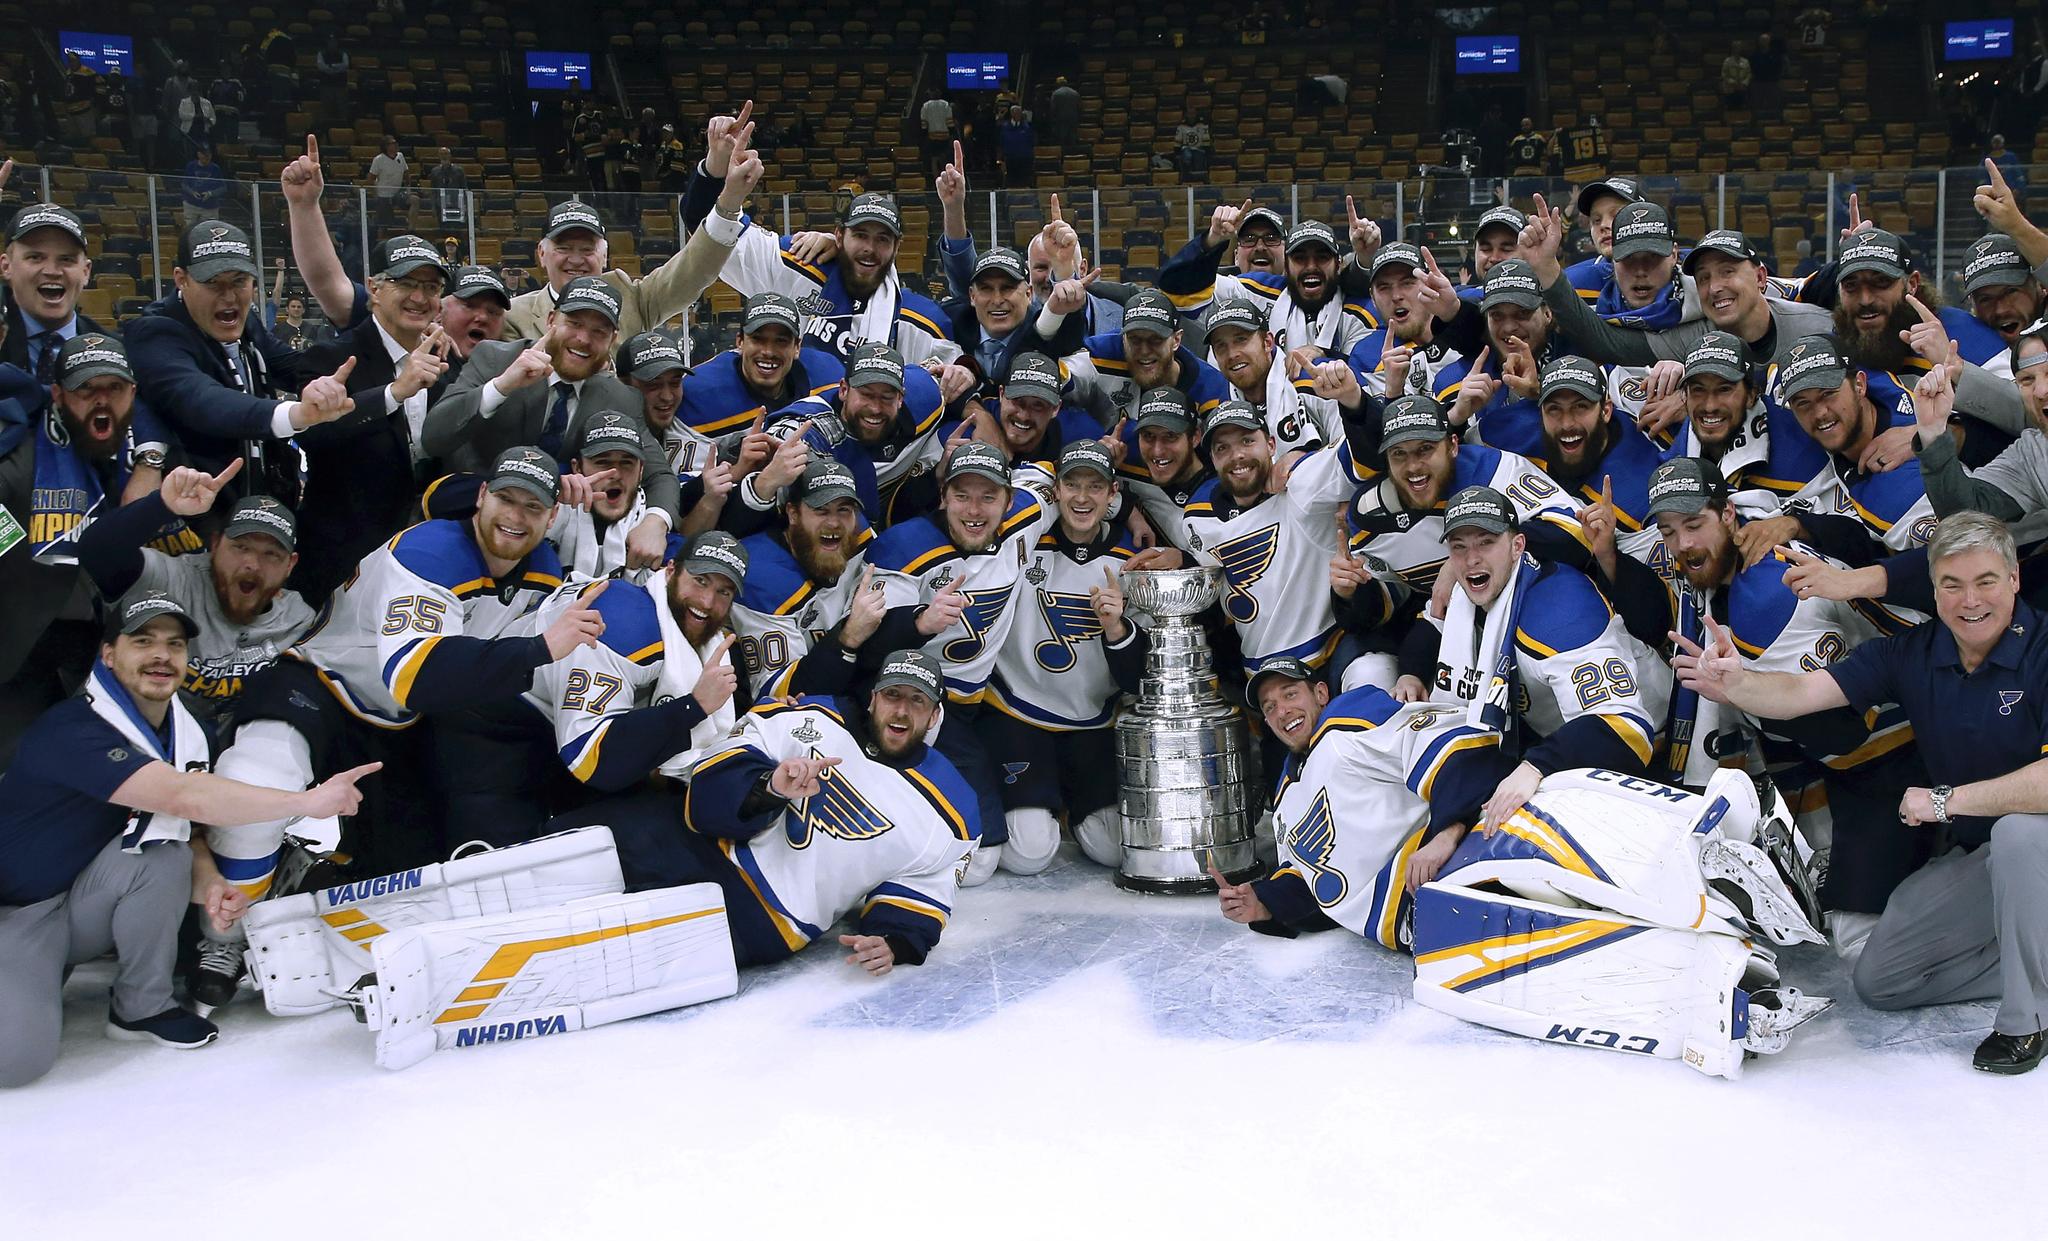 NHL 스탠리컵 파이널에서 우승한 인트루이스 선수들. [AP=연합뉴스]